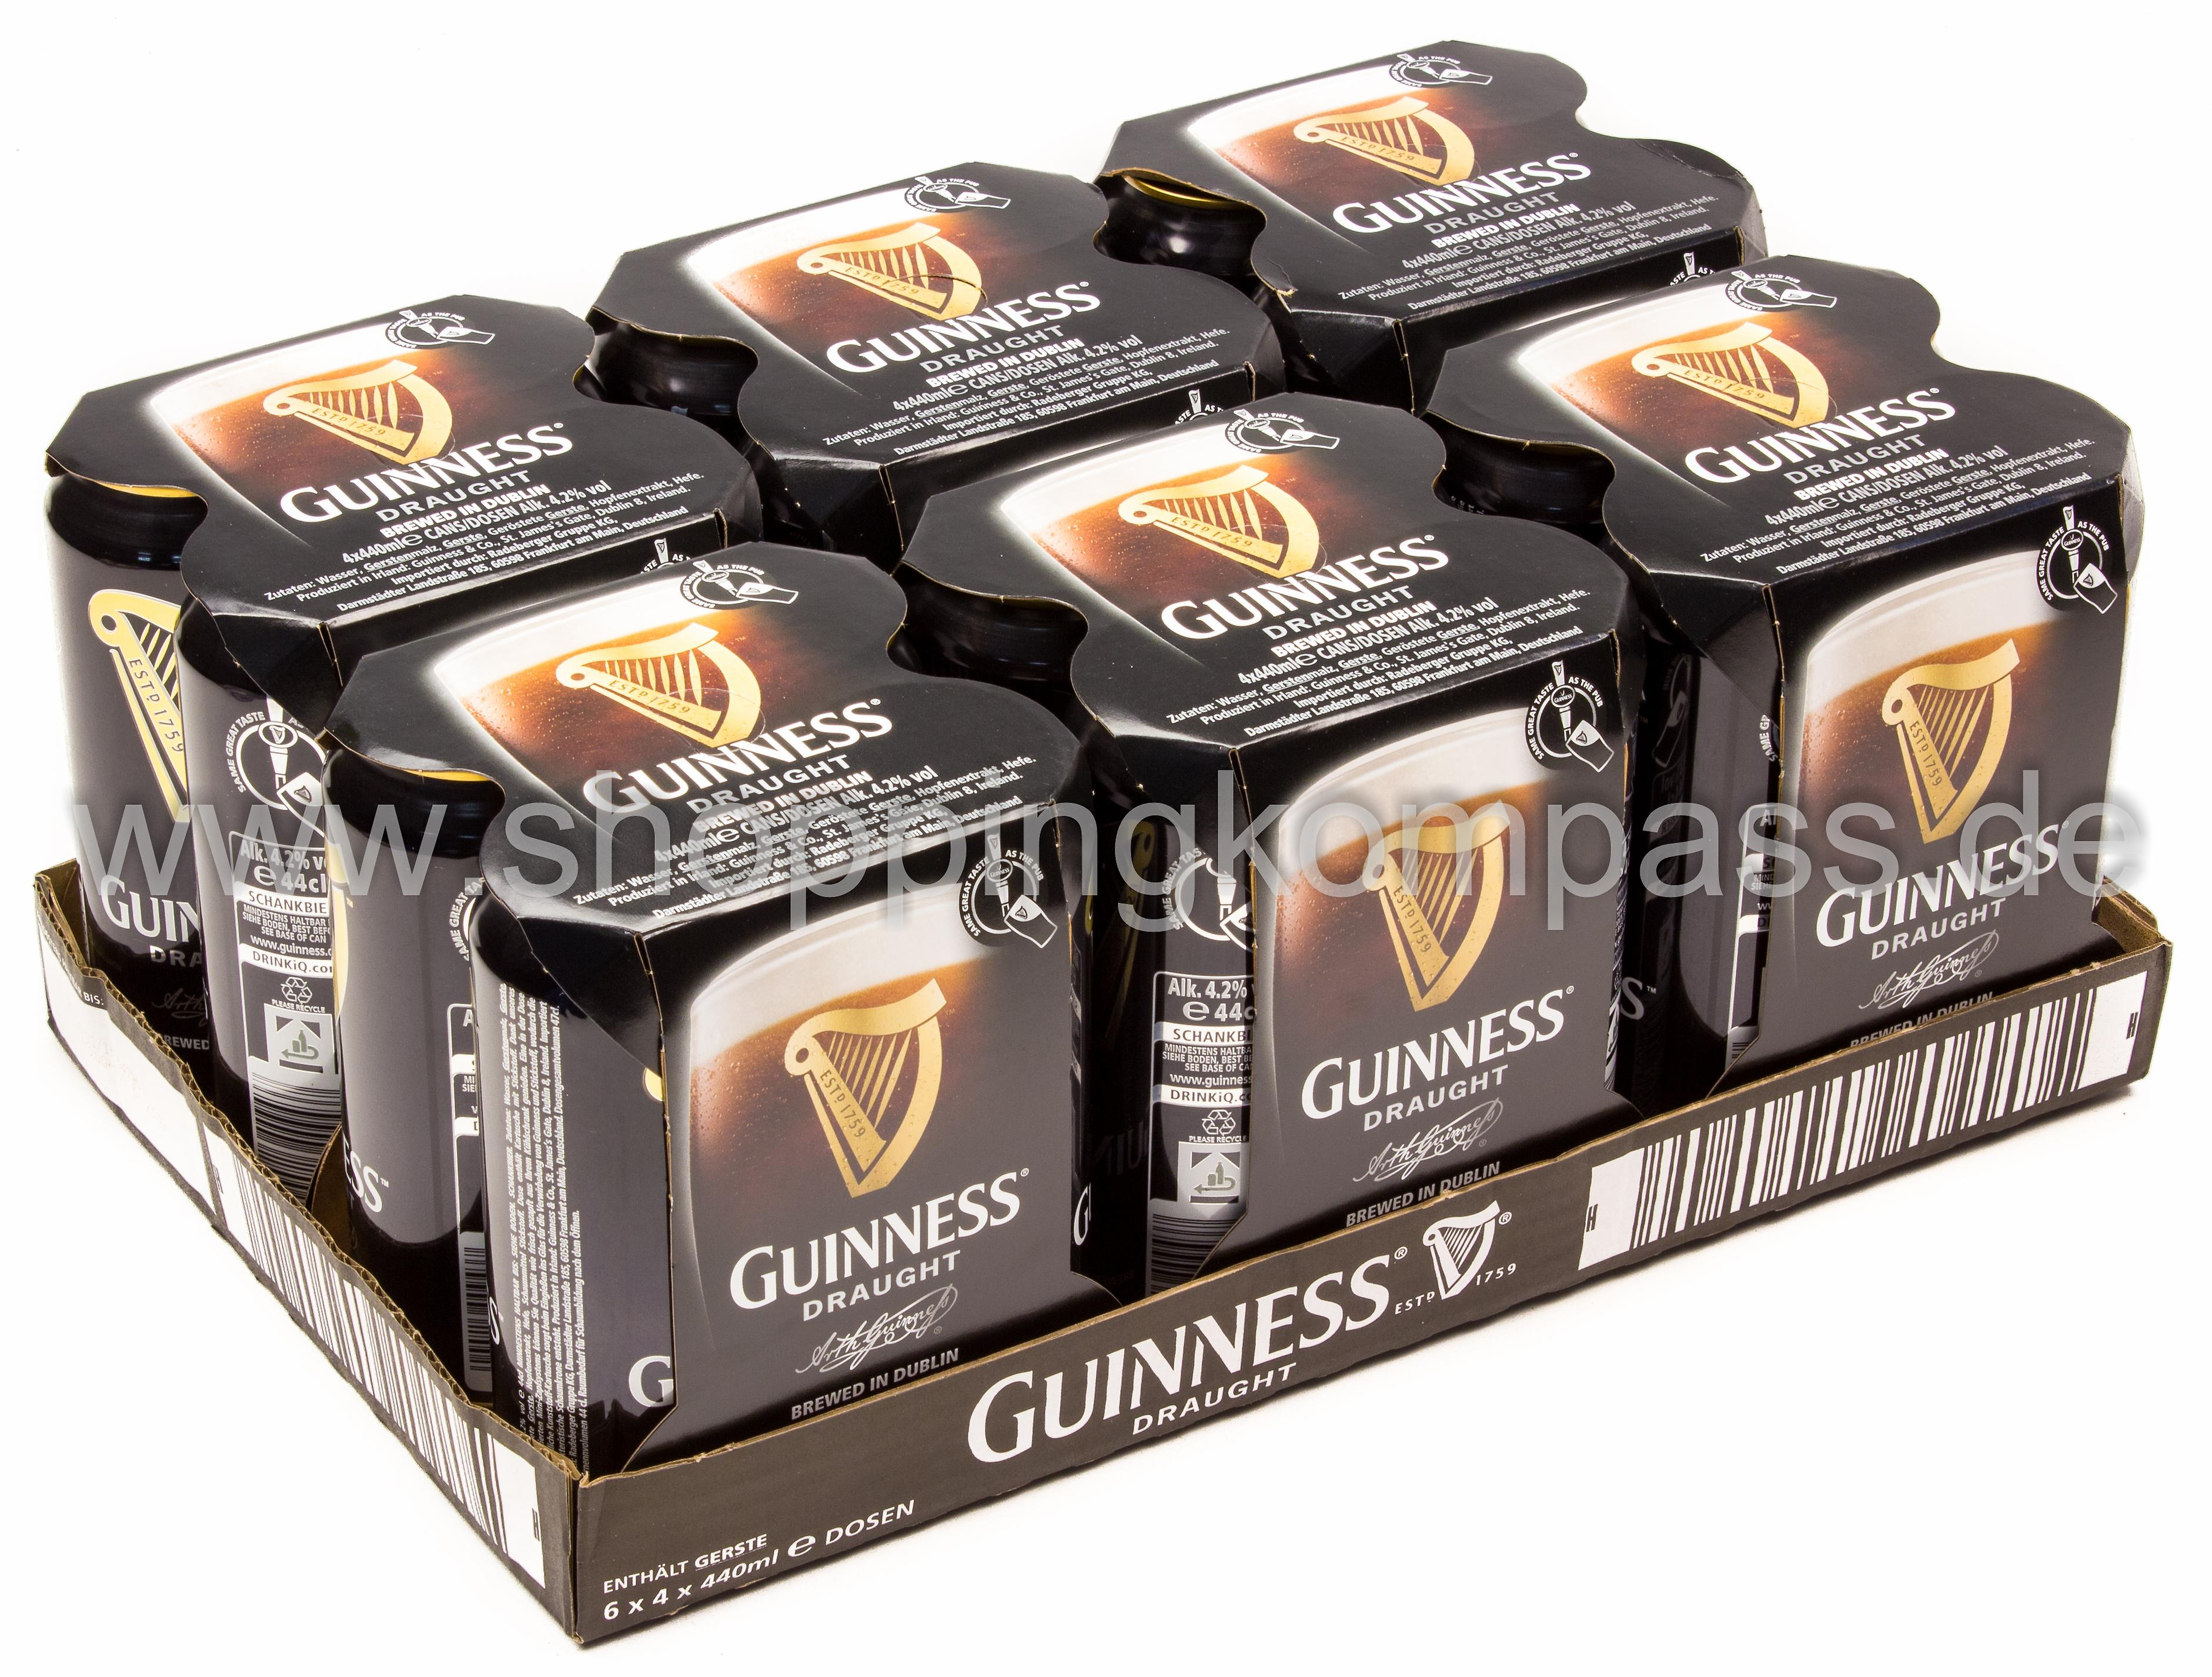 Guinness Draught Karton 6 x 4 x 0,44 l Dose EW